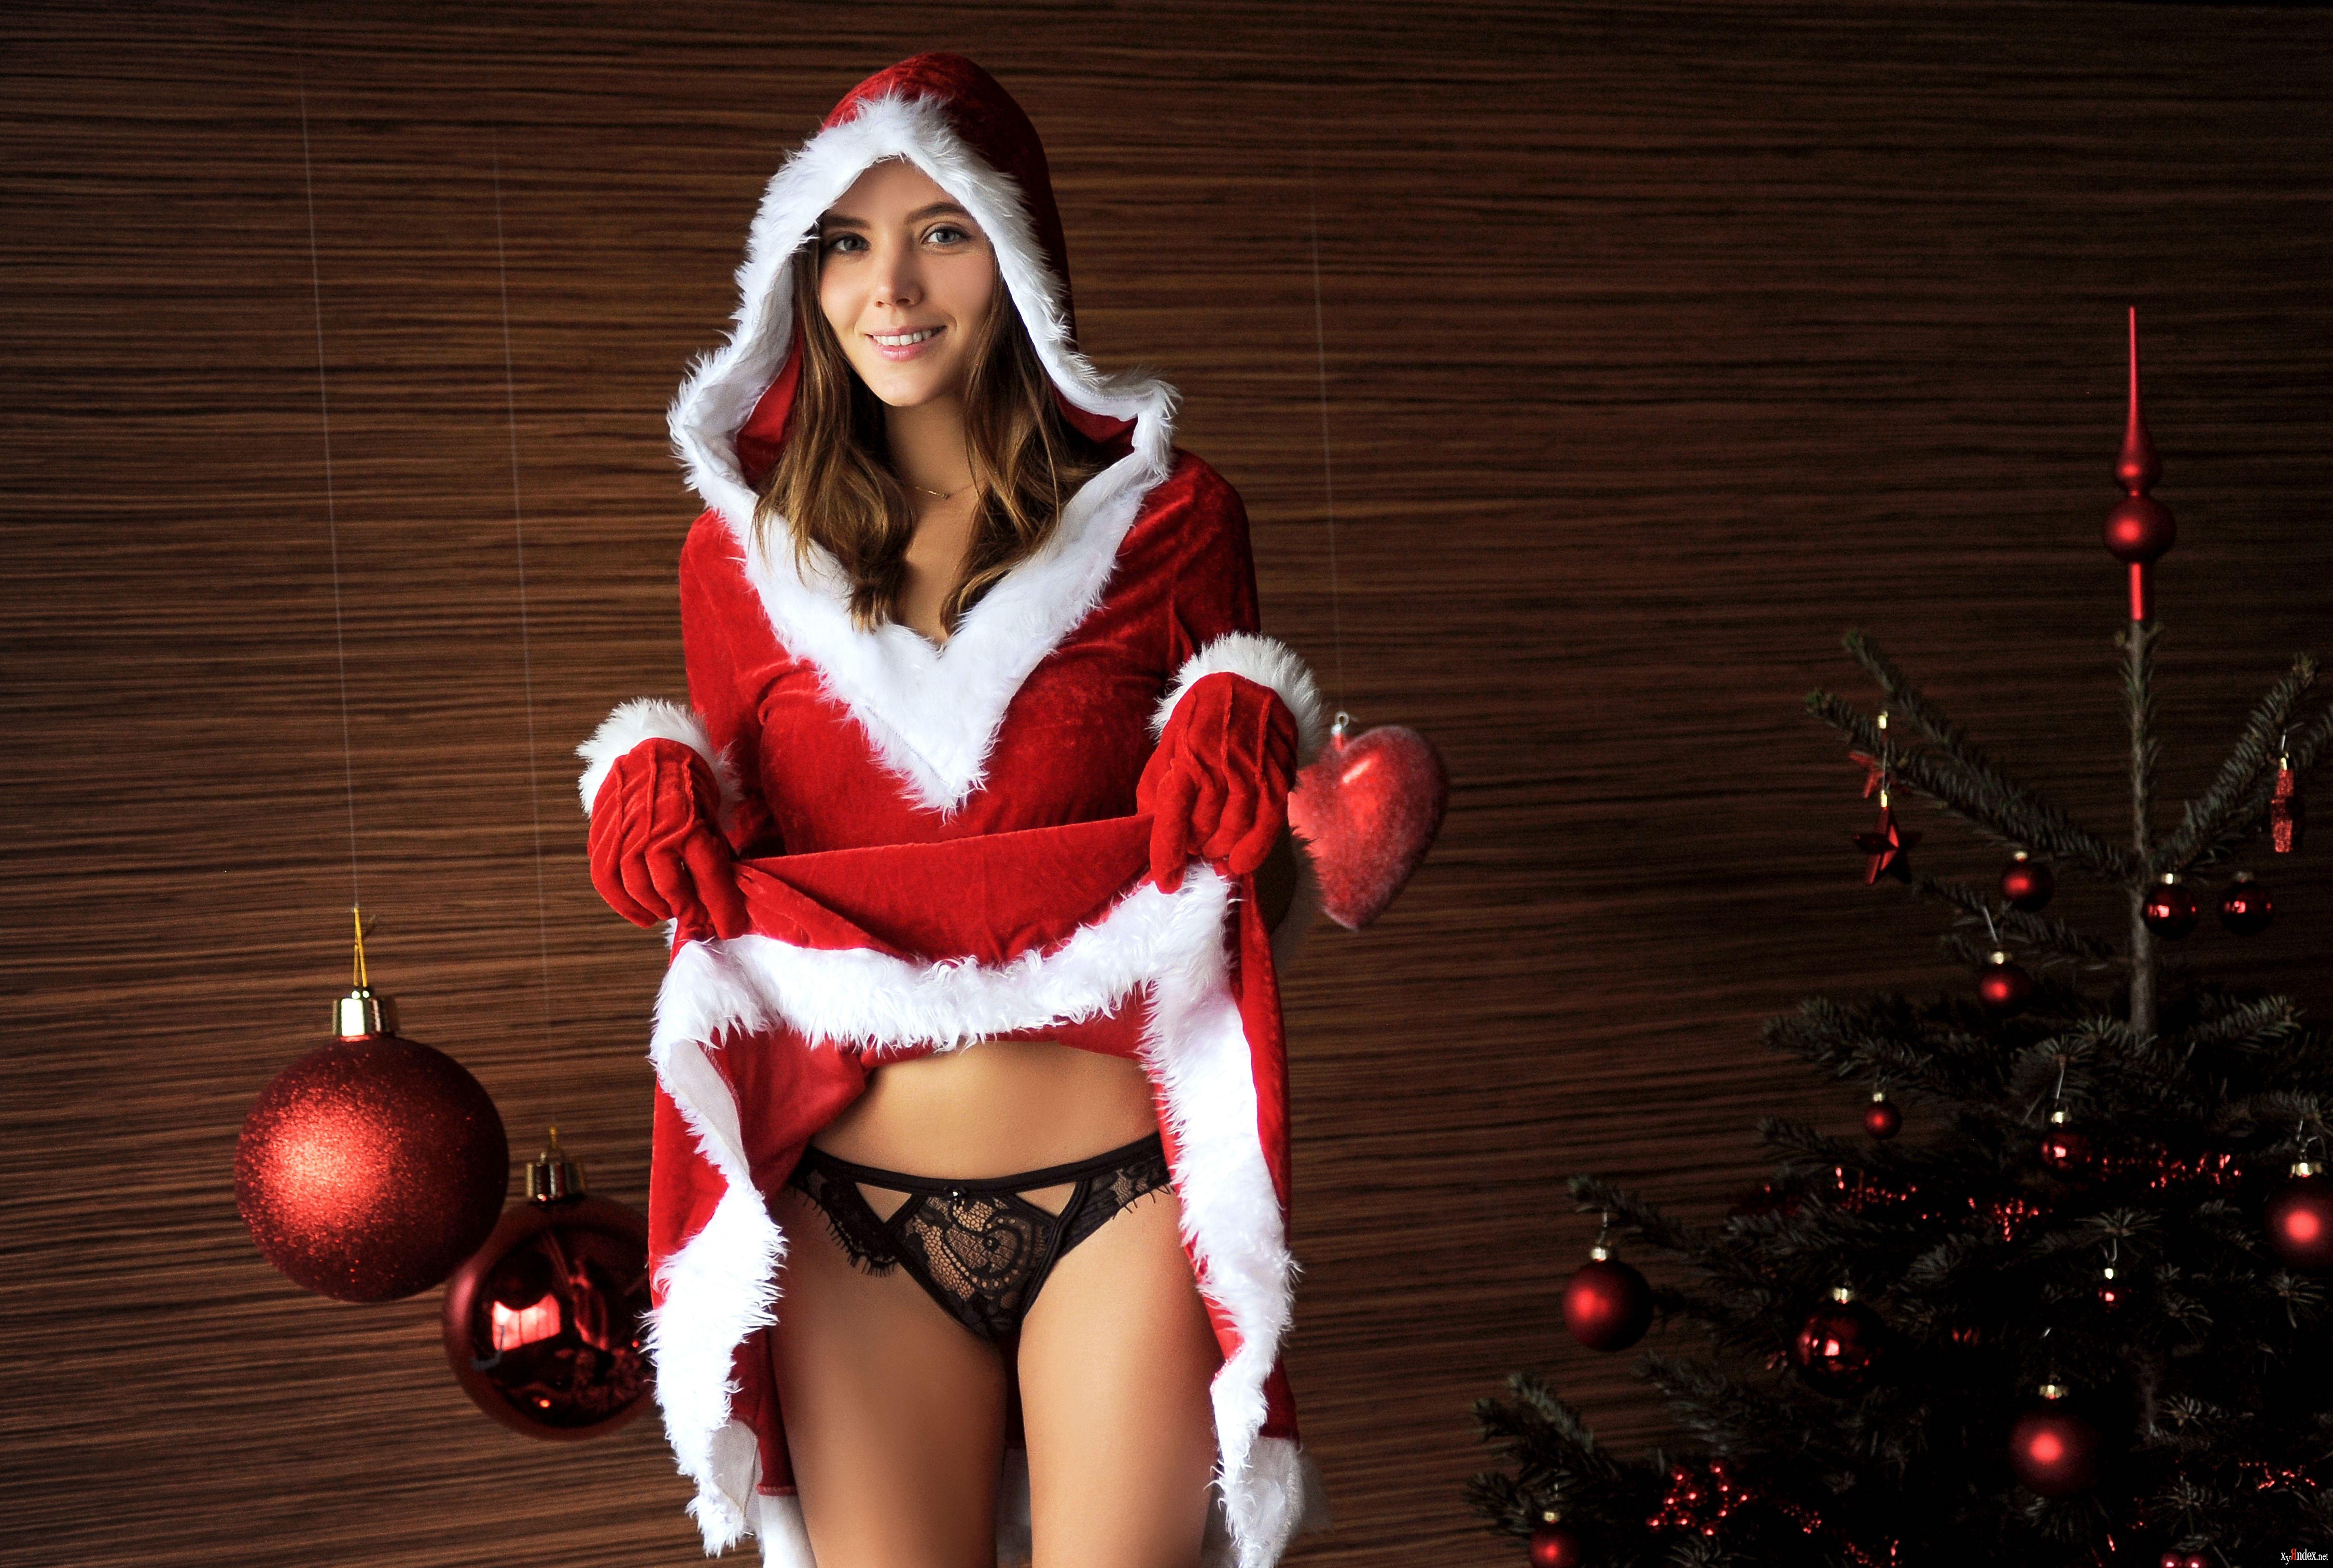 Santa claus is holding shrunken red santa suit pants stock photo